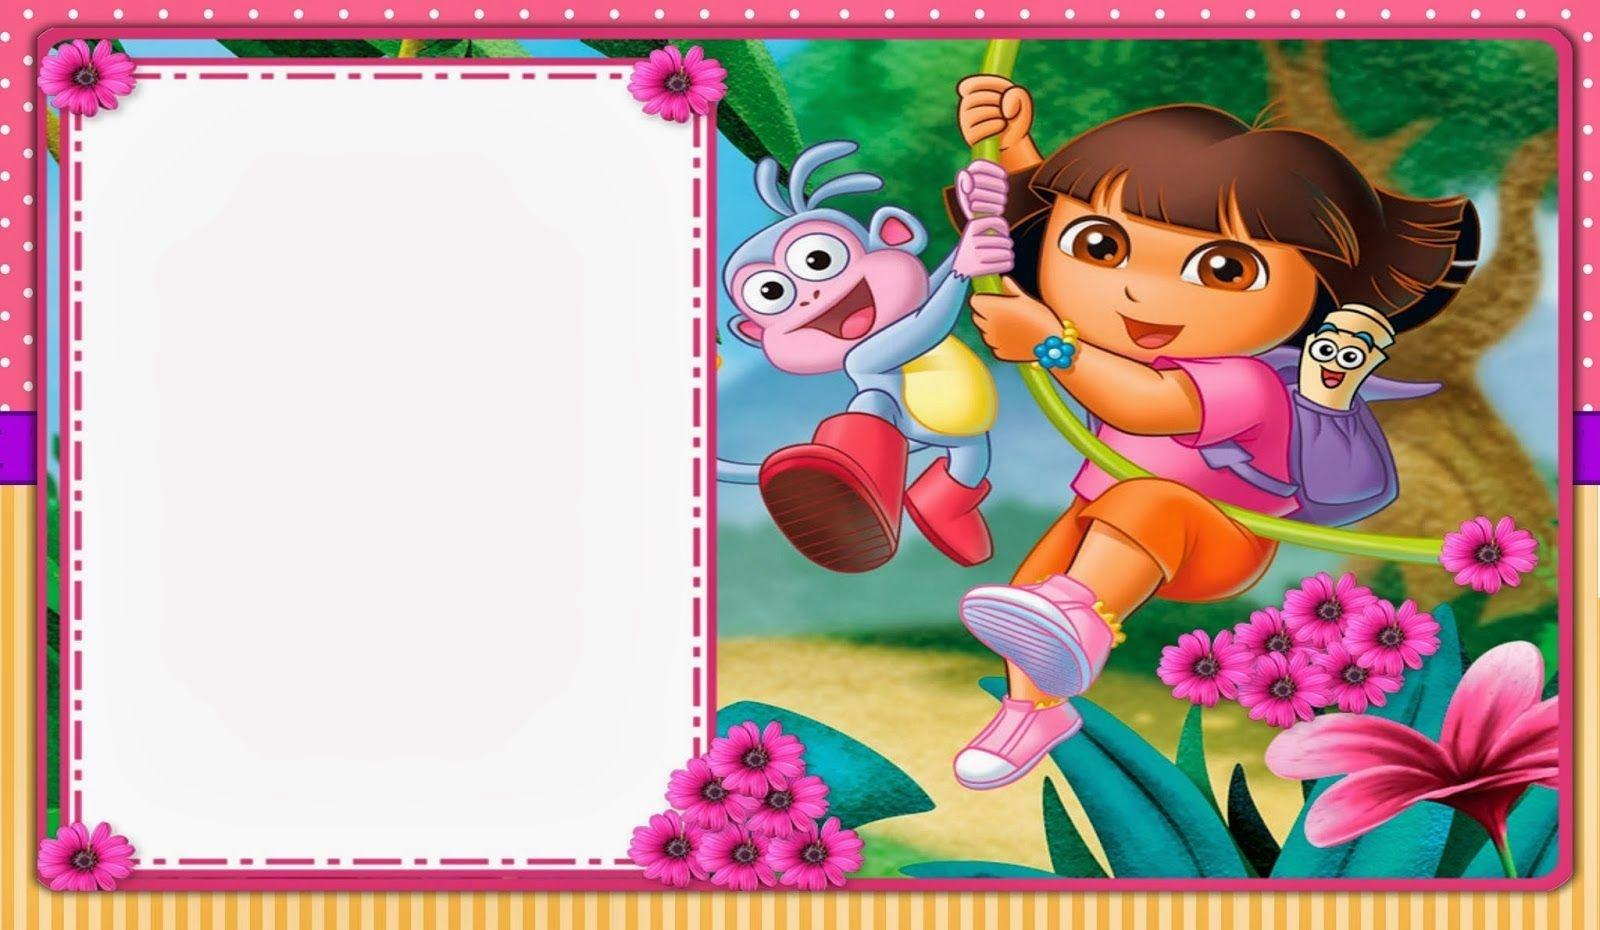 Dora The Explorer: Free Printable Invitations And Party Printables - Dora Birthday Cards Free Printable